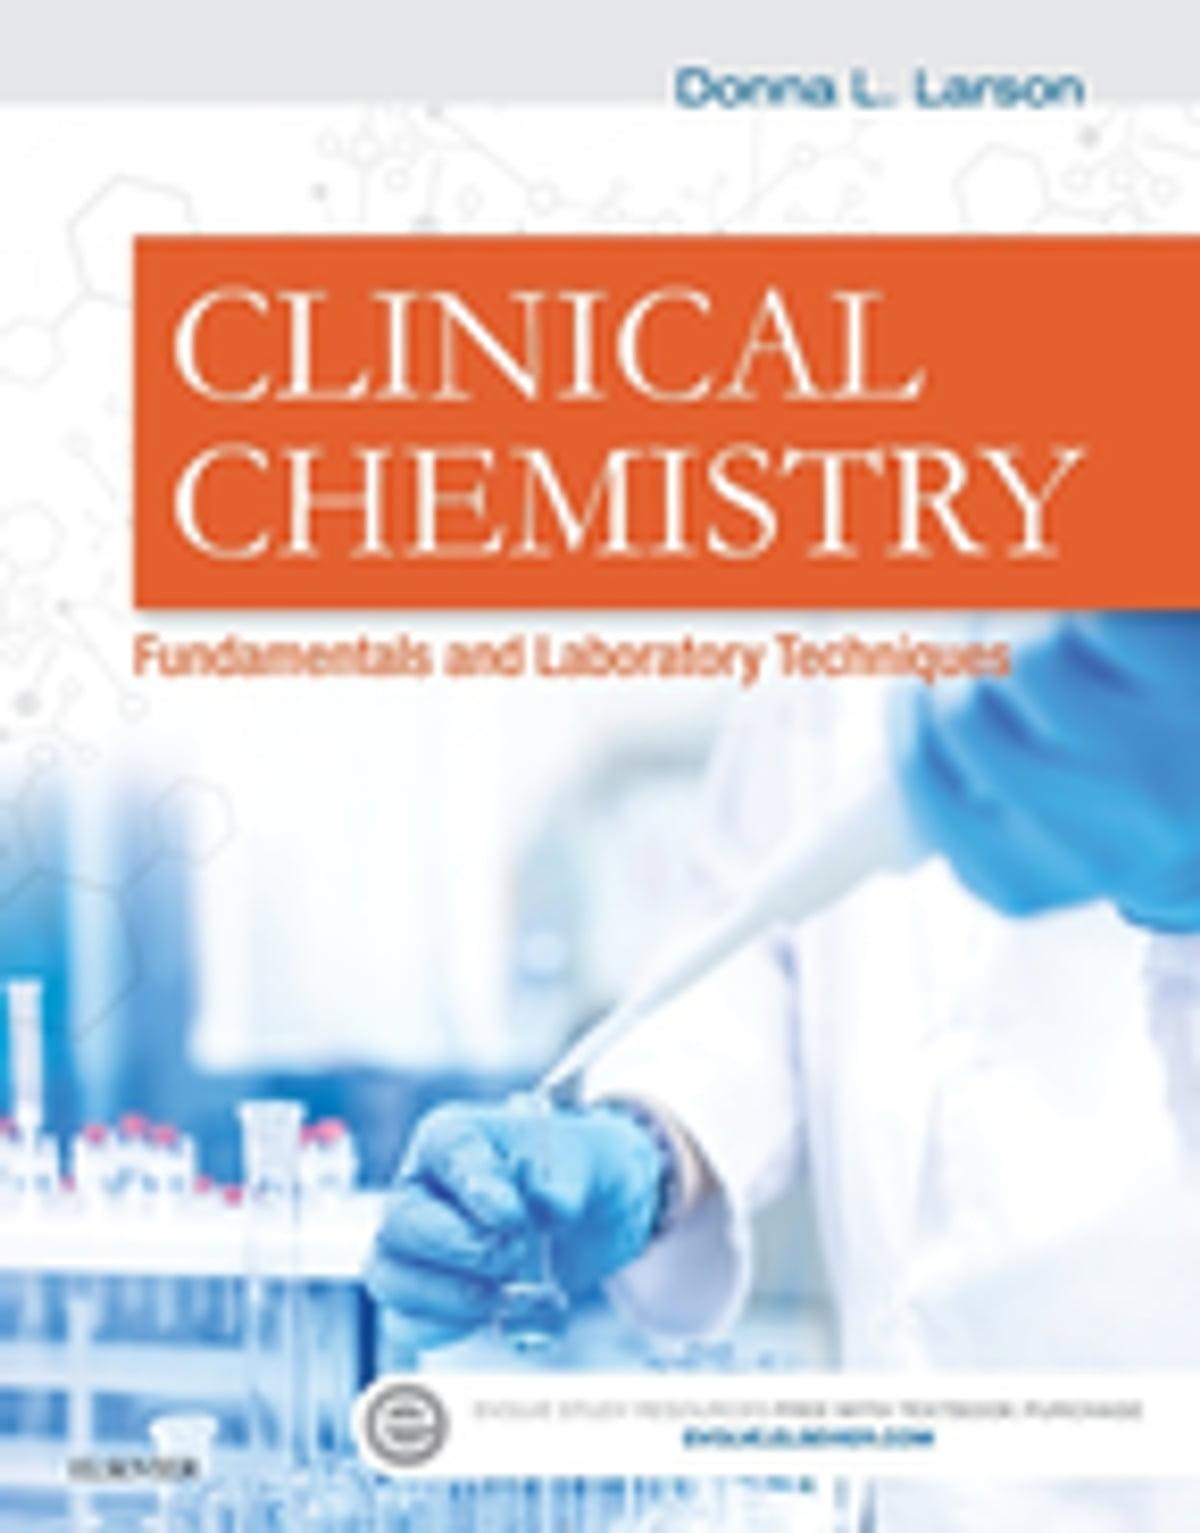 Clinical Chemistry - E-Book eBook by Donna Larson - 9780323292535 | Rakuten Kobo United States